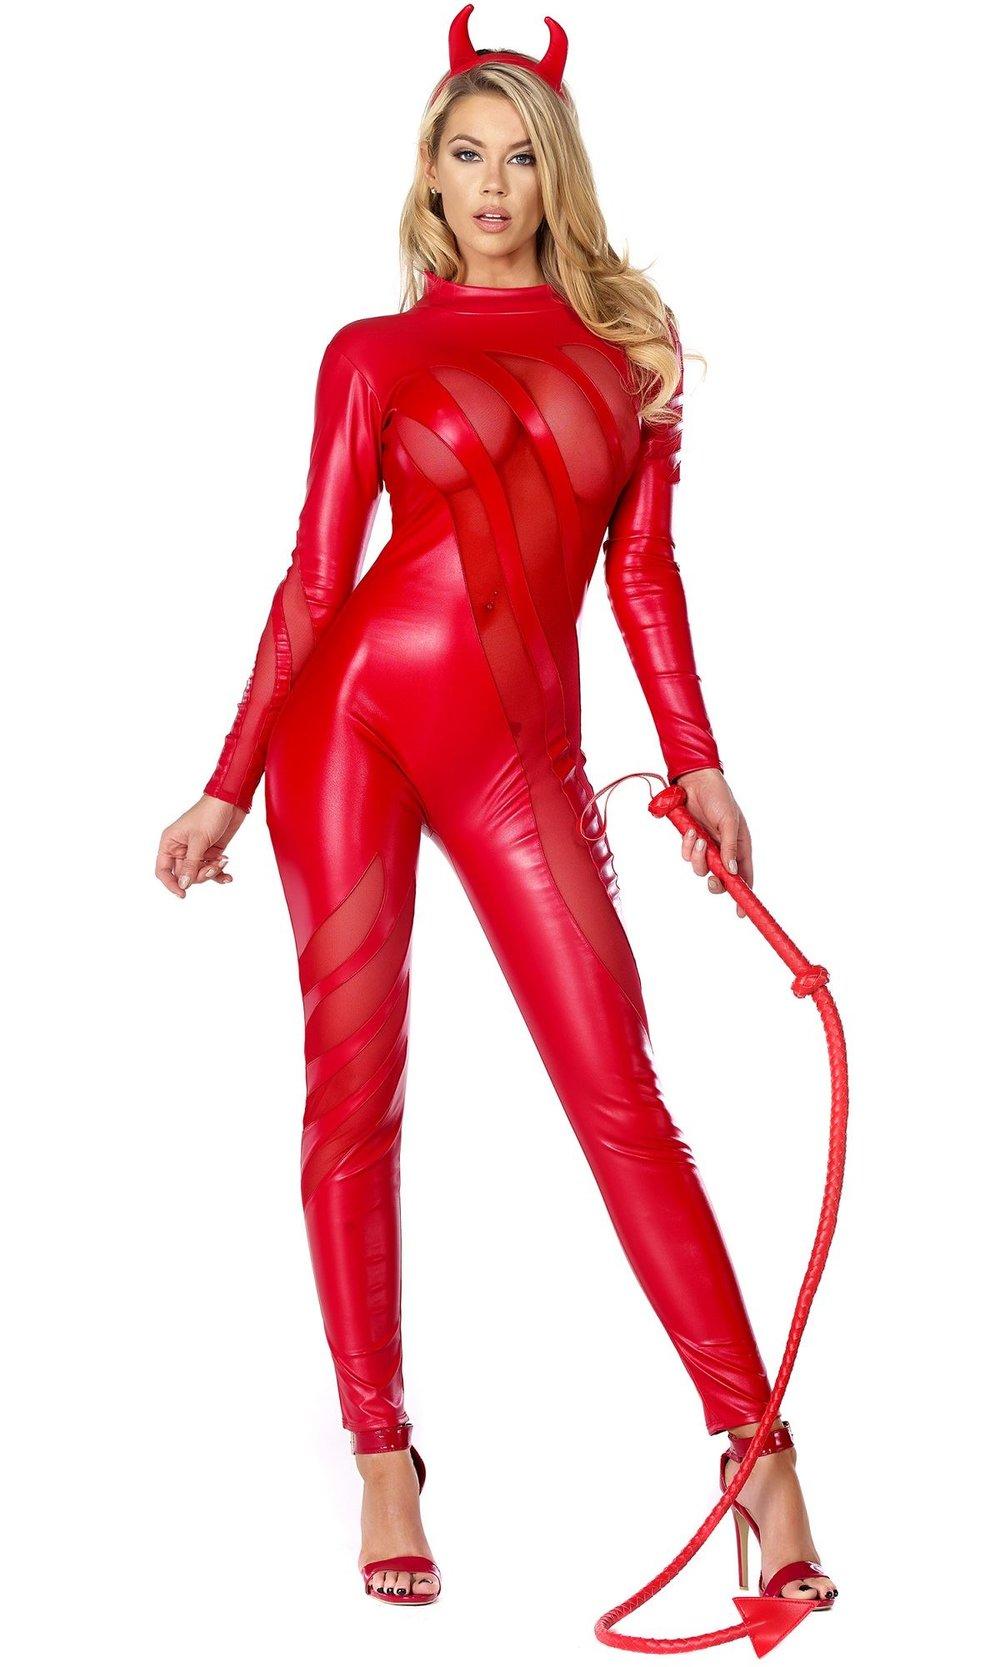 fr555220-vile-vixen-woman-devil-halloween-costumes.jpg